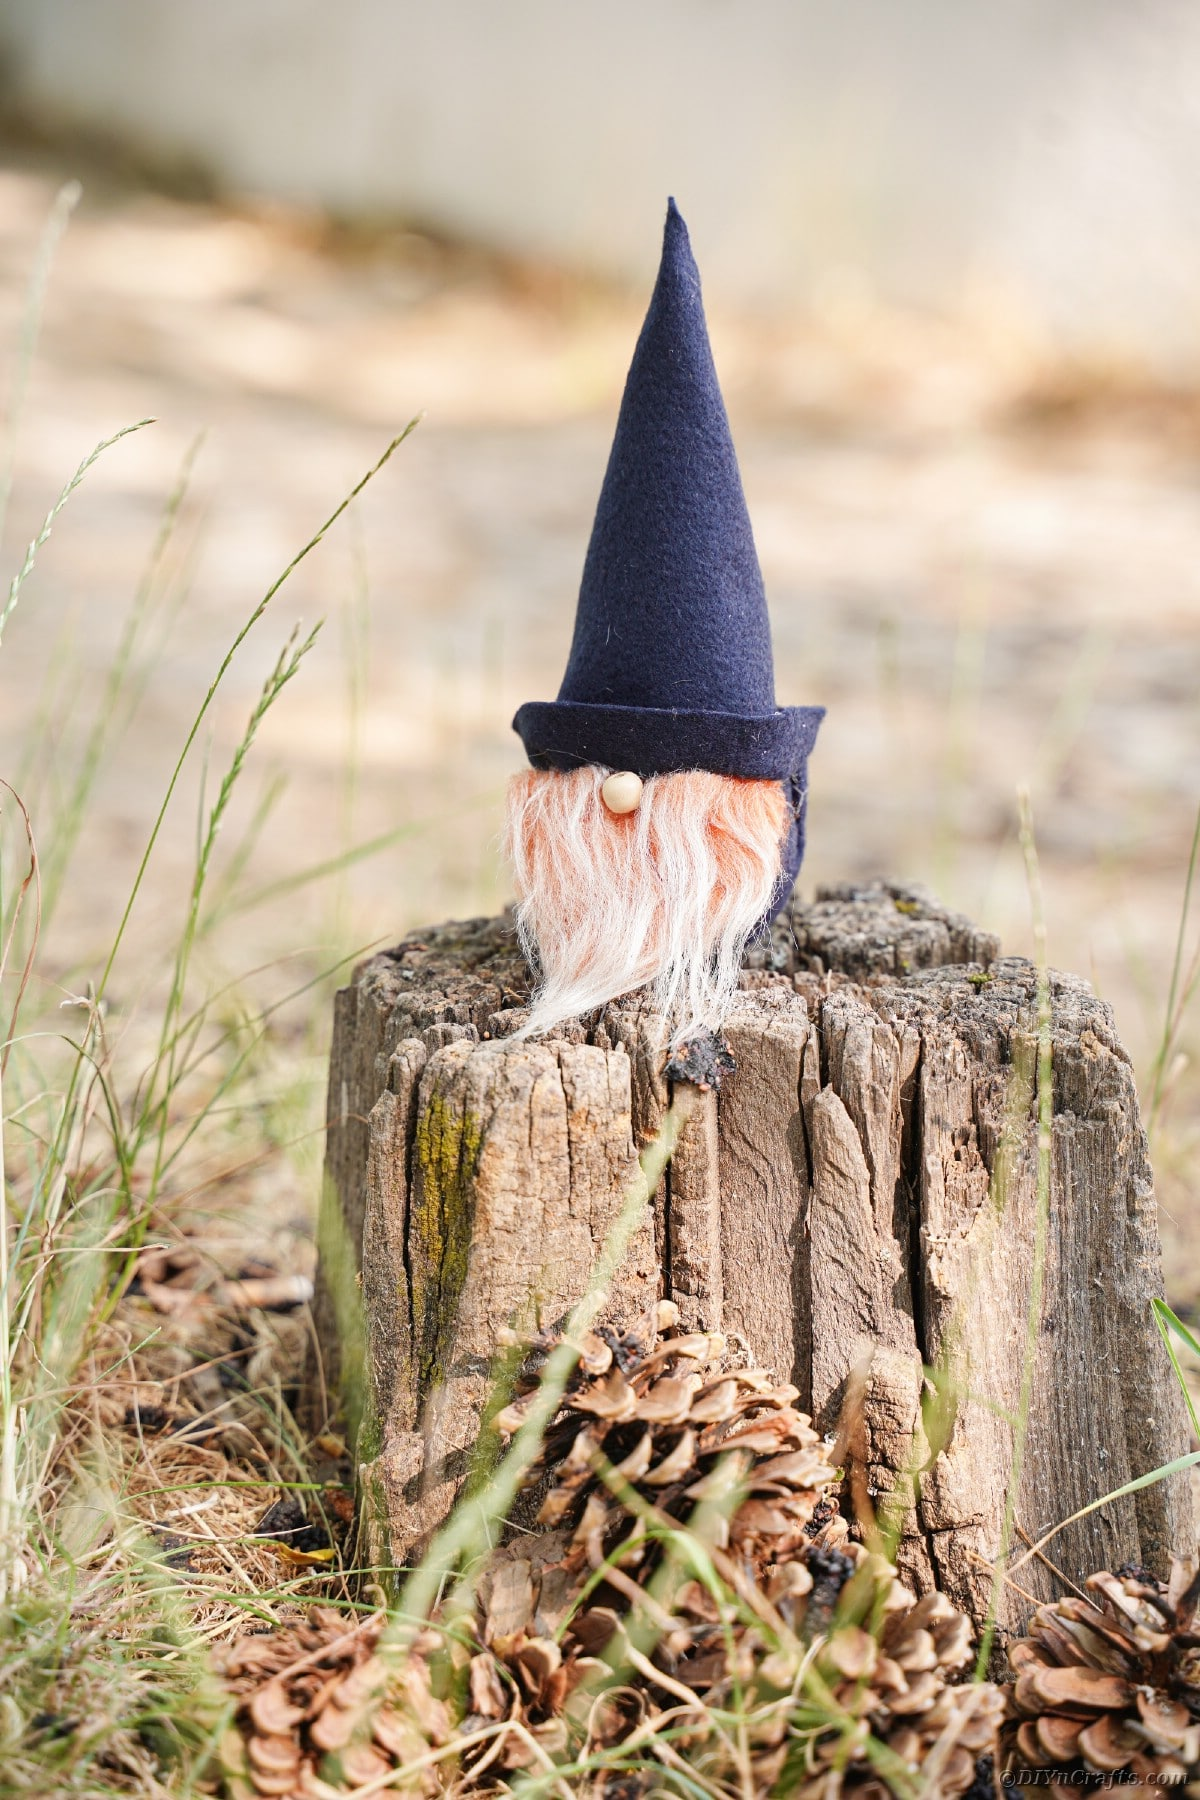 Gnome on tree stump